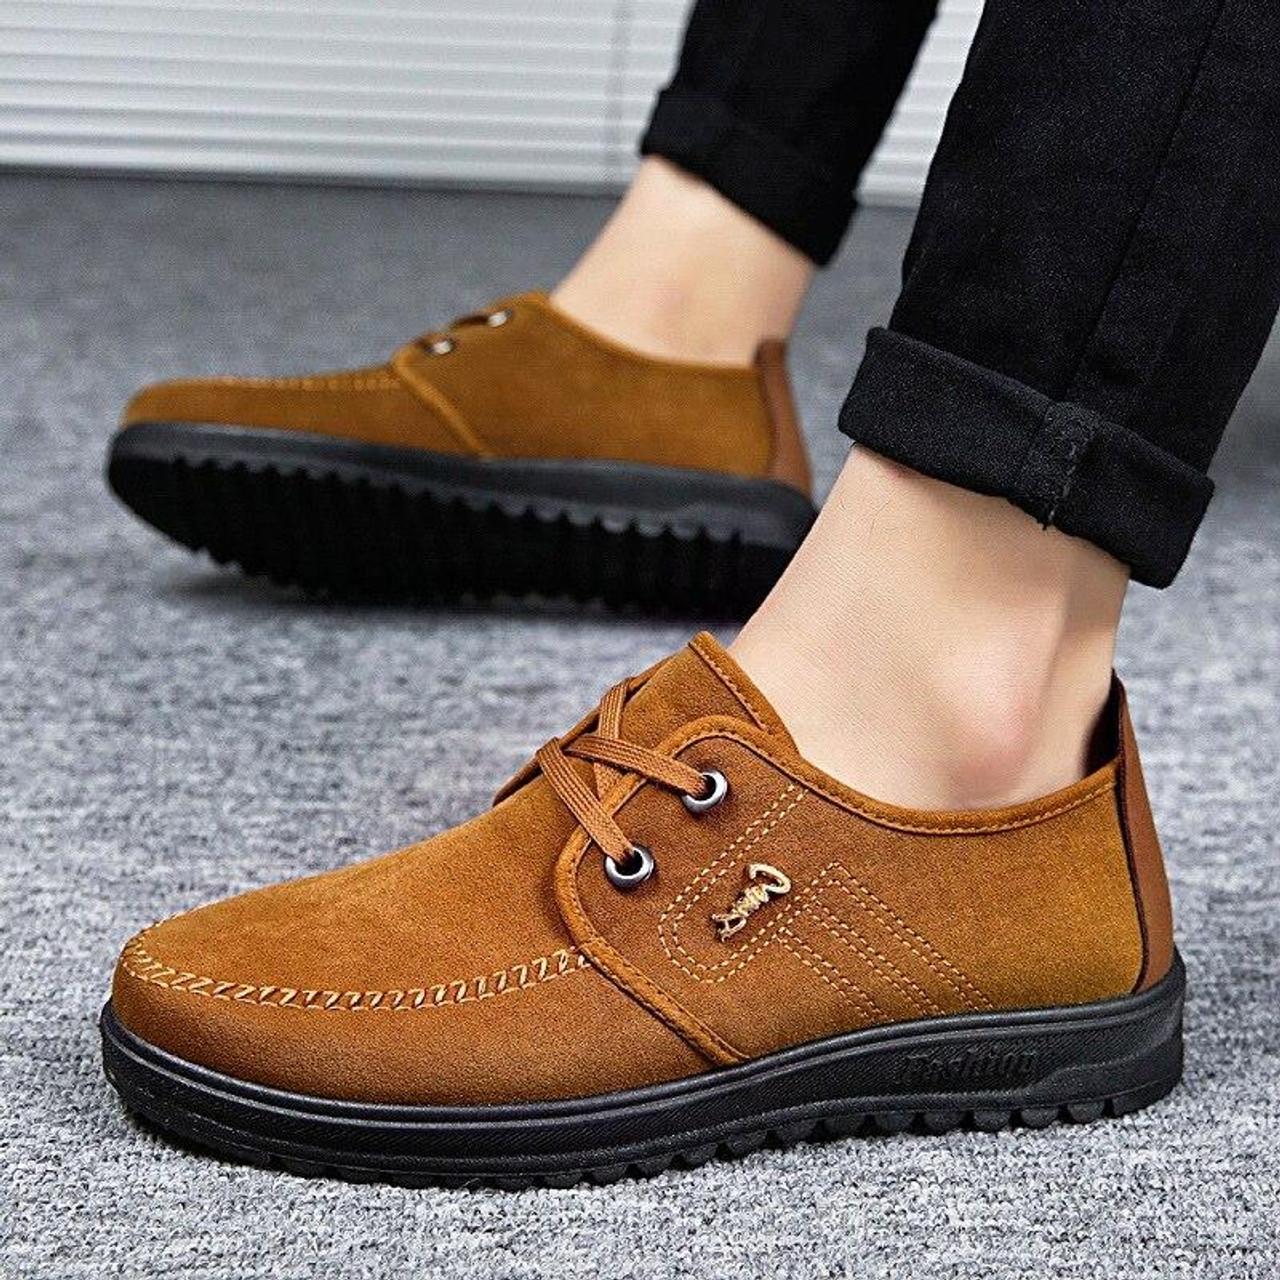 Shoes Men's 2019 Spring